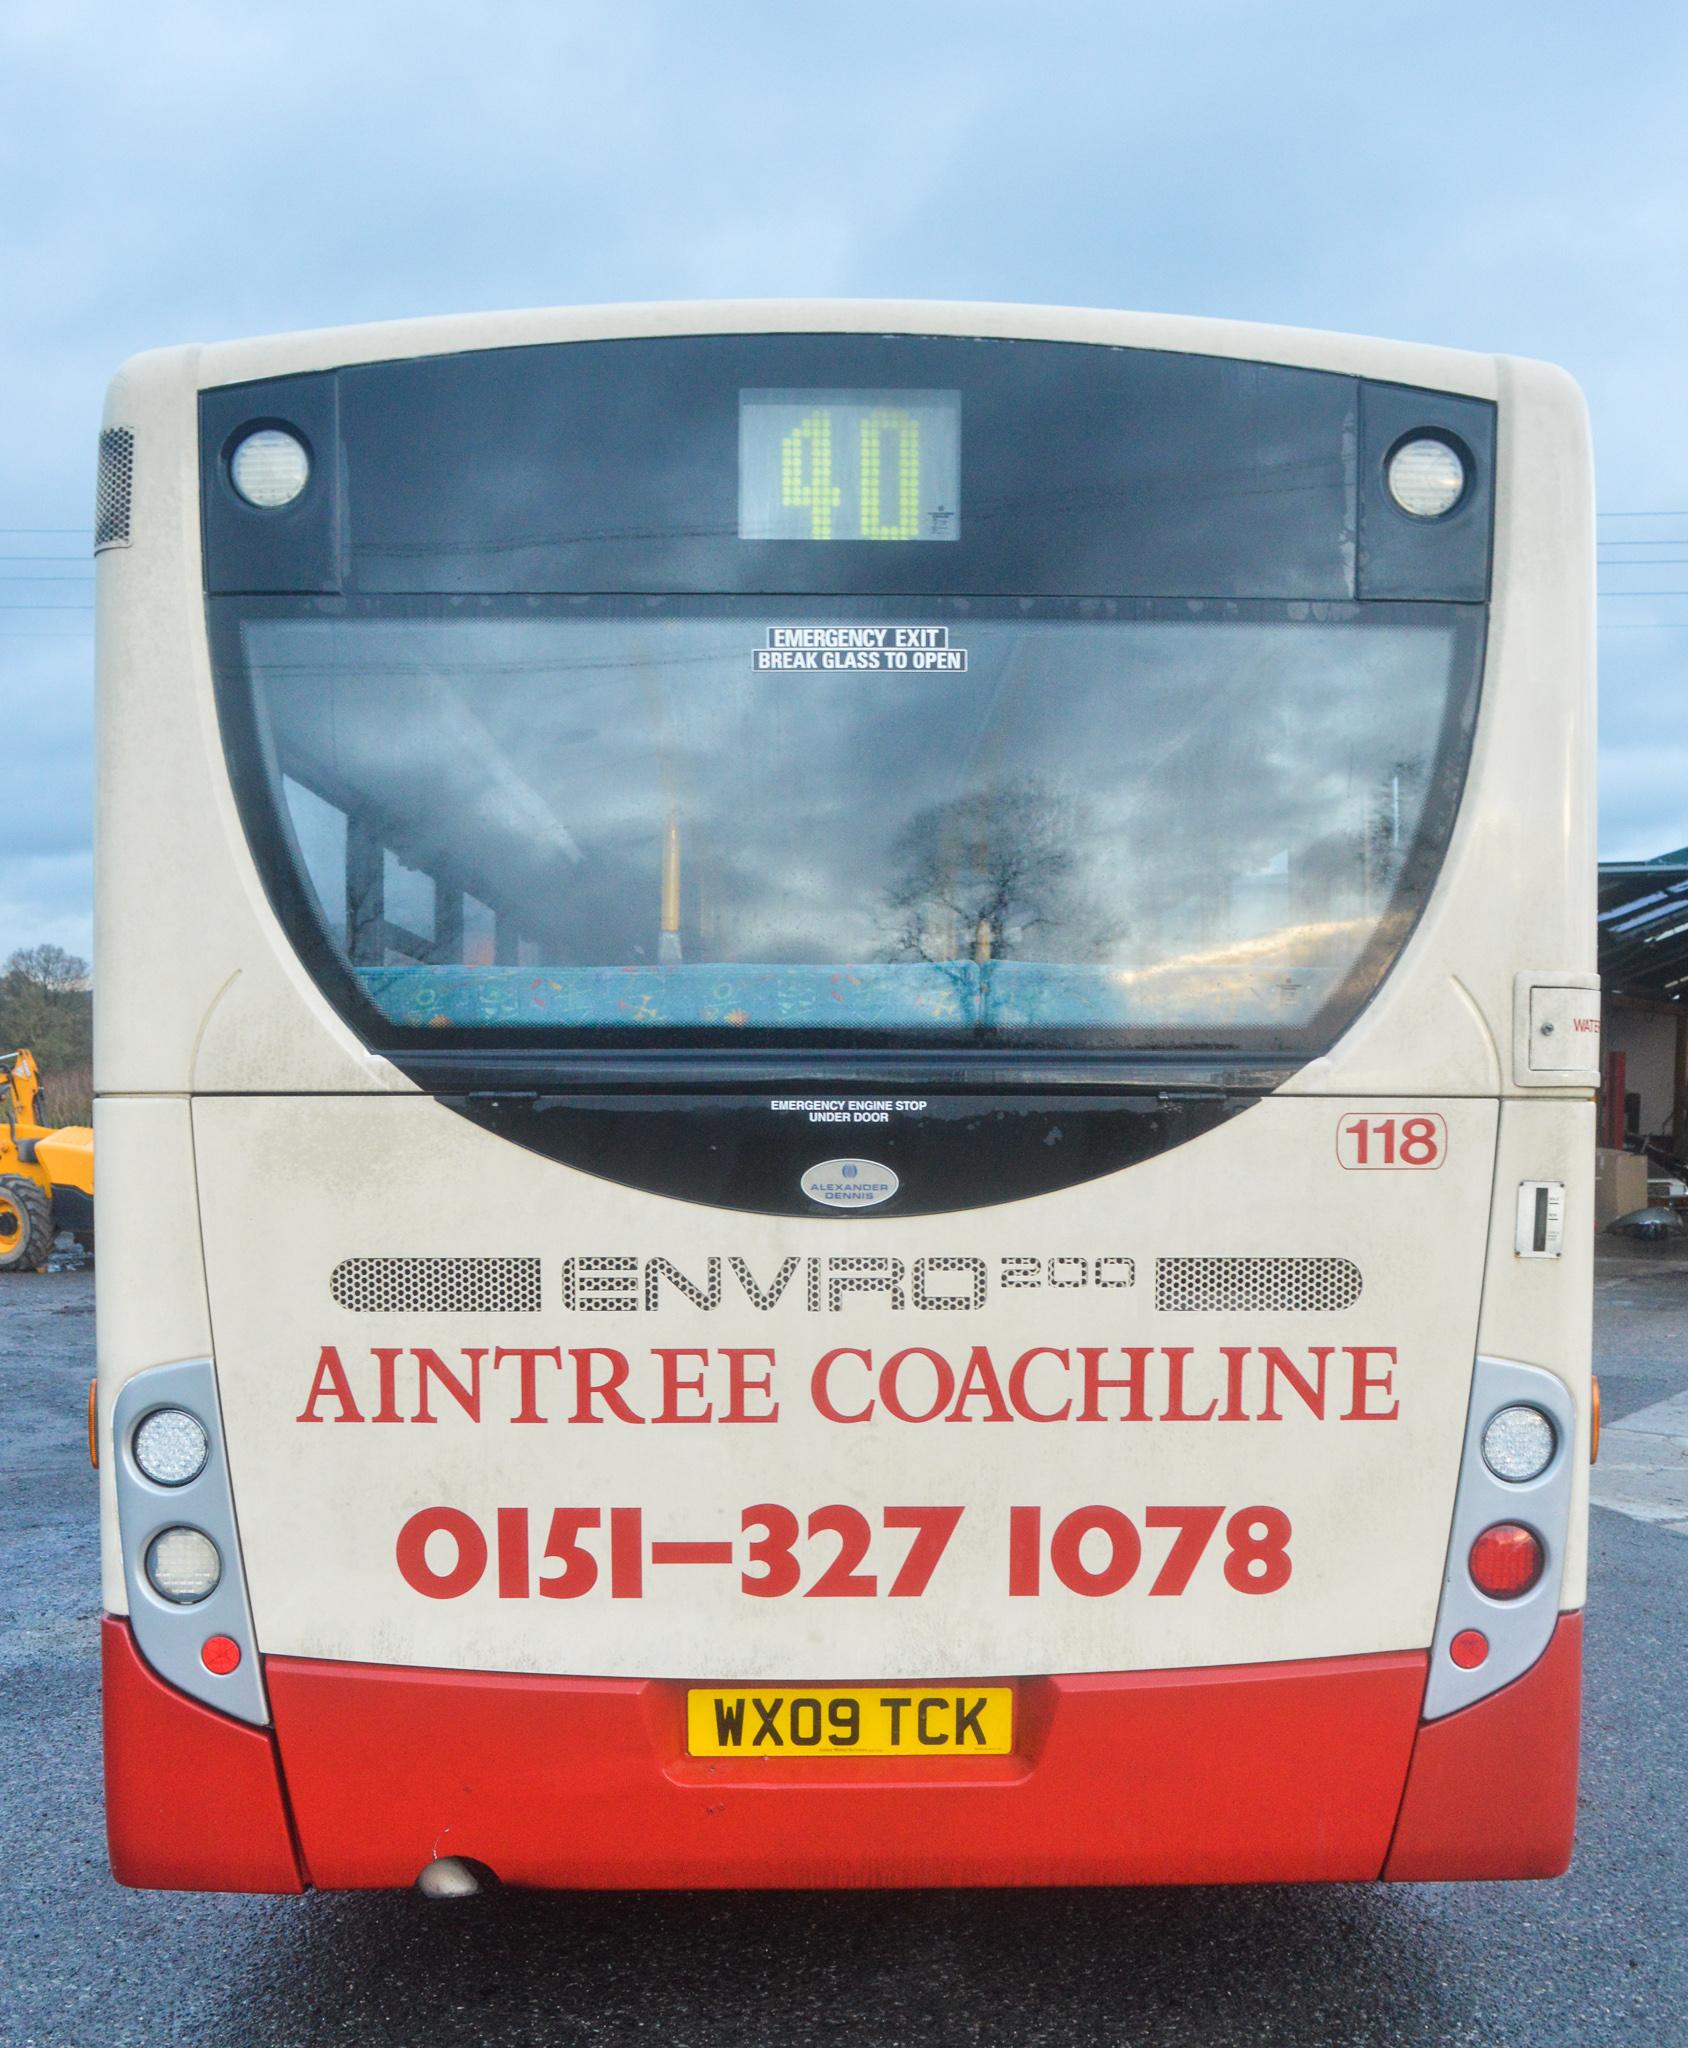 Lot 3 - Alexander Dennis Dart 4 Enviro 2000 29 seat single deck service bus Registration Number: WX09 TCK